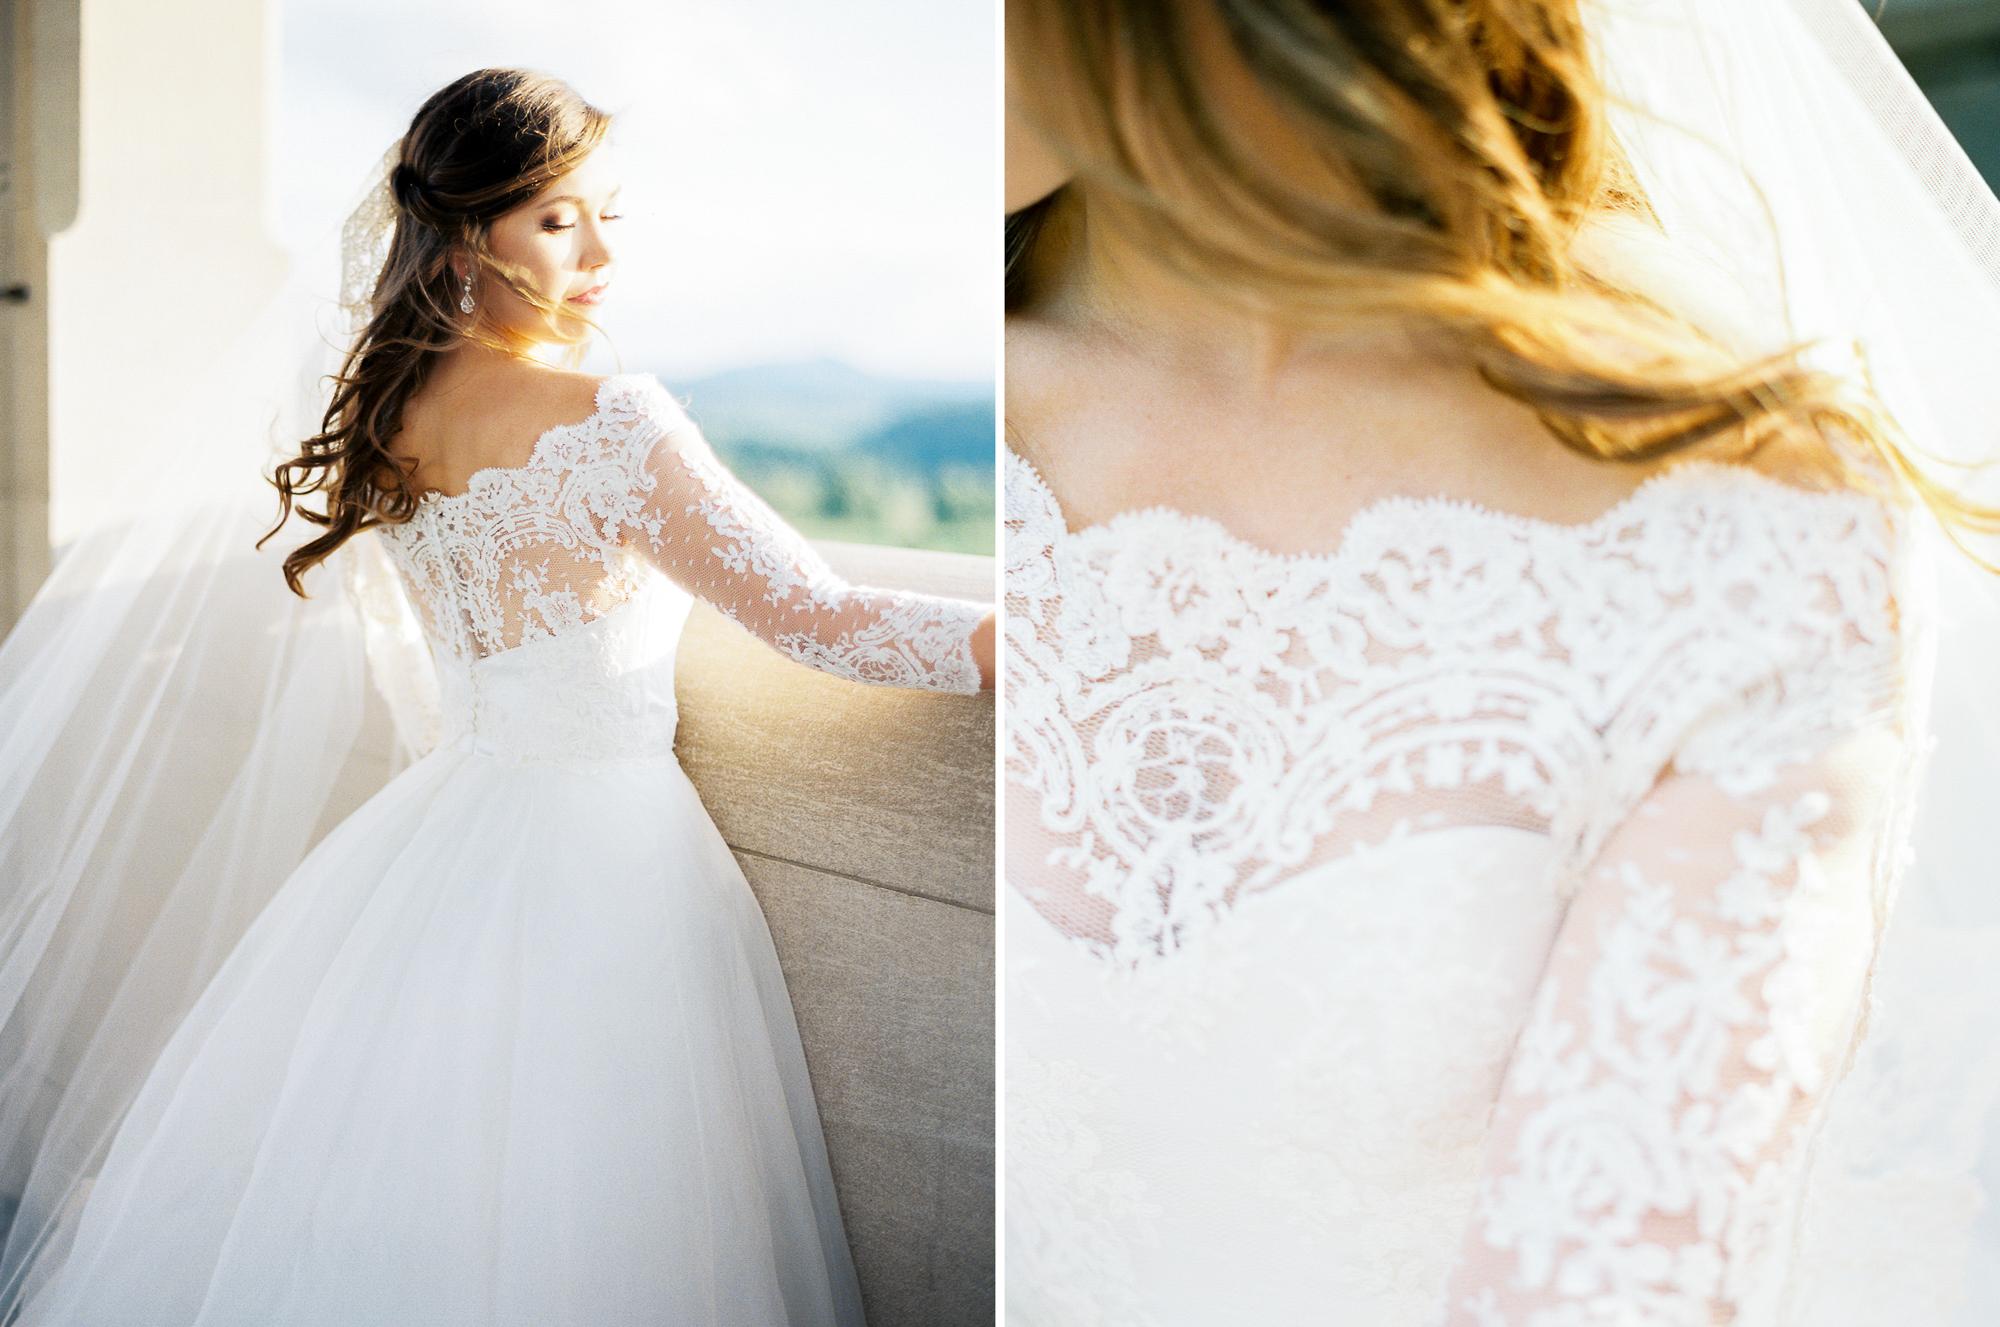 timeless-classy-cathedral-veil-bridal-session-biltmore-north-carolina-wedding-film-photographer-14.jpg